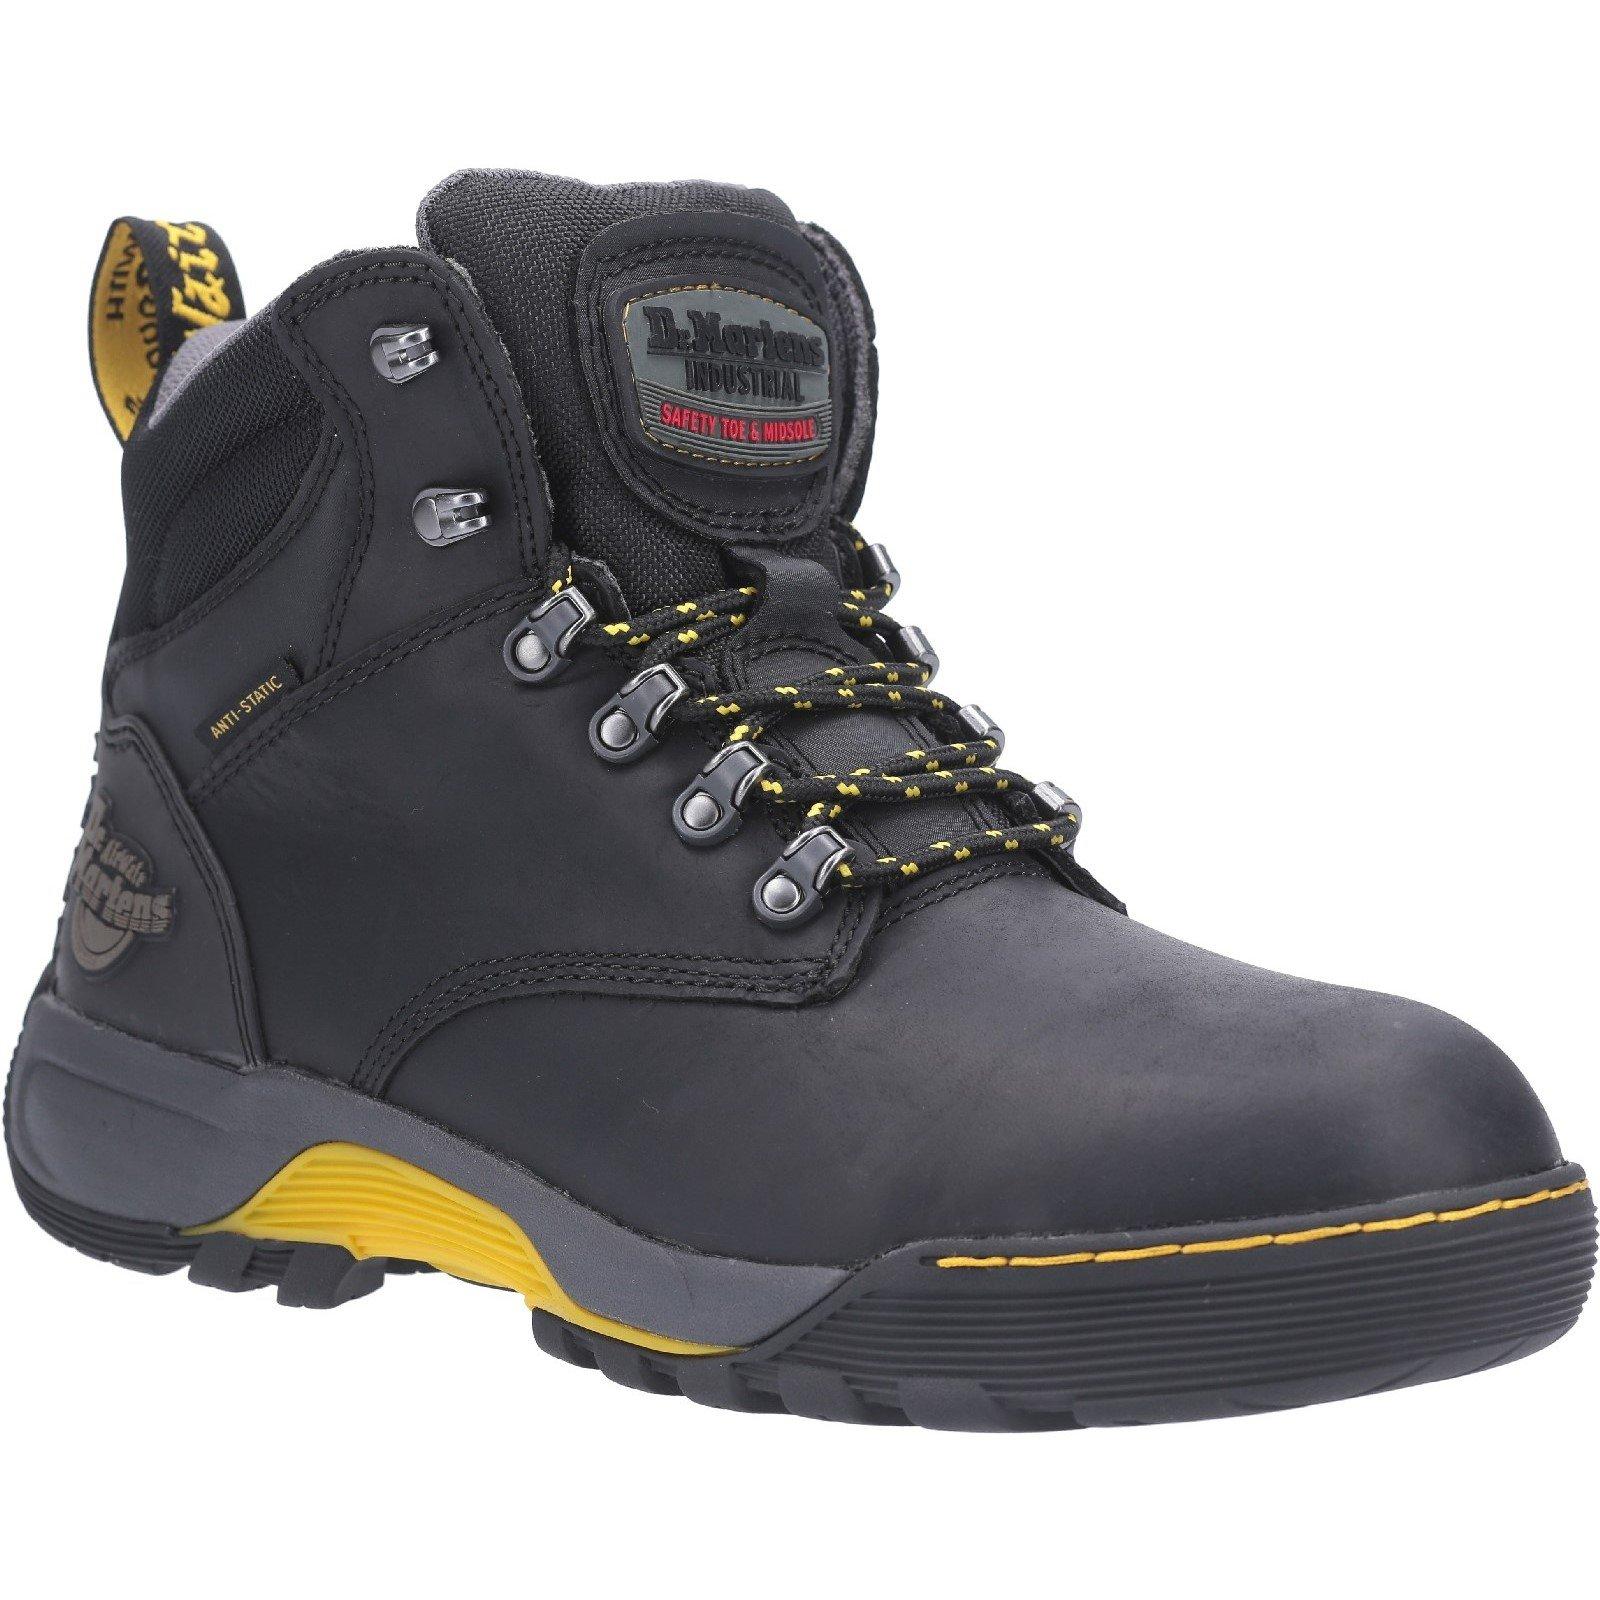 Dr Martens Unisex Ridge ST Lace Up Hiker Safety Boot Black 28324 - Black 12